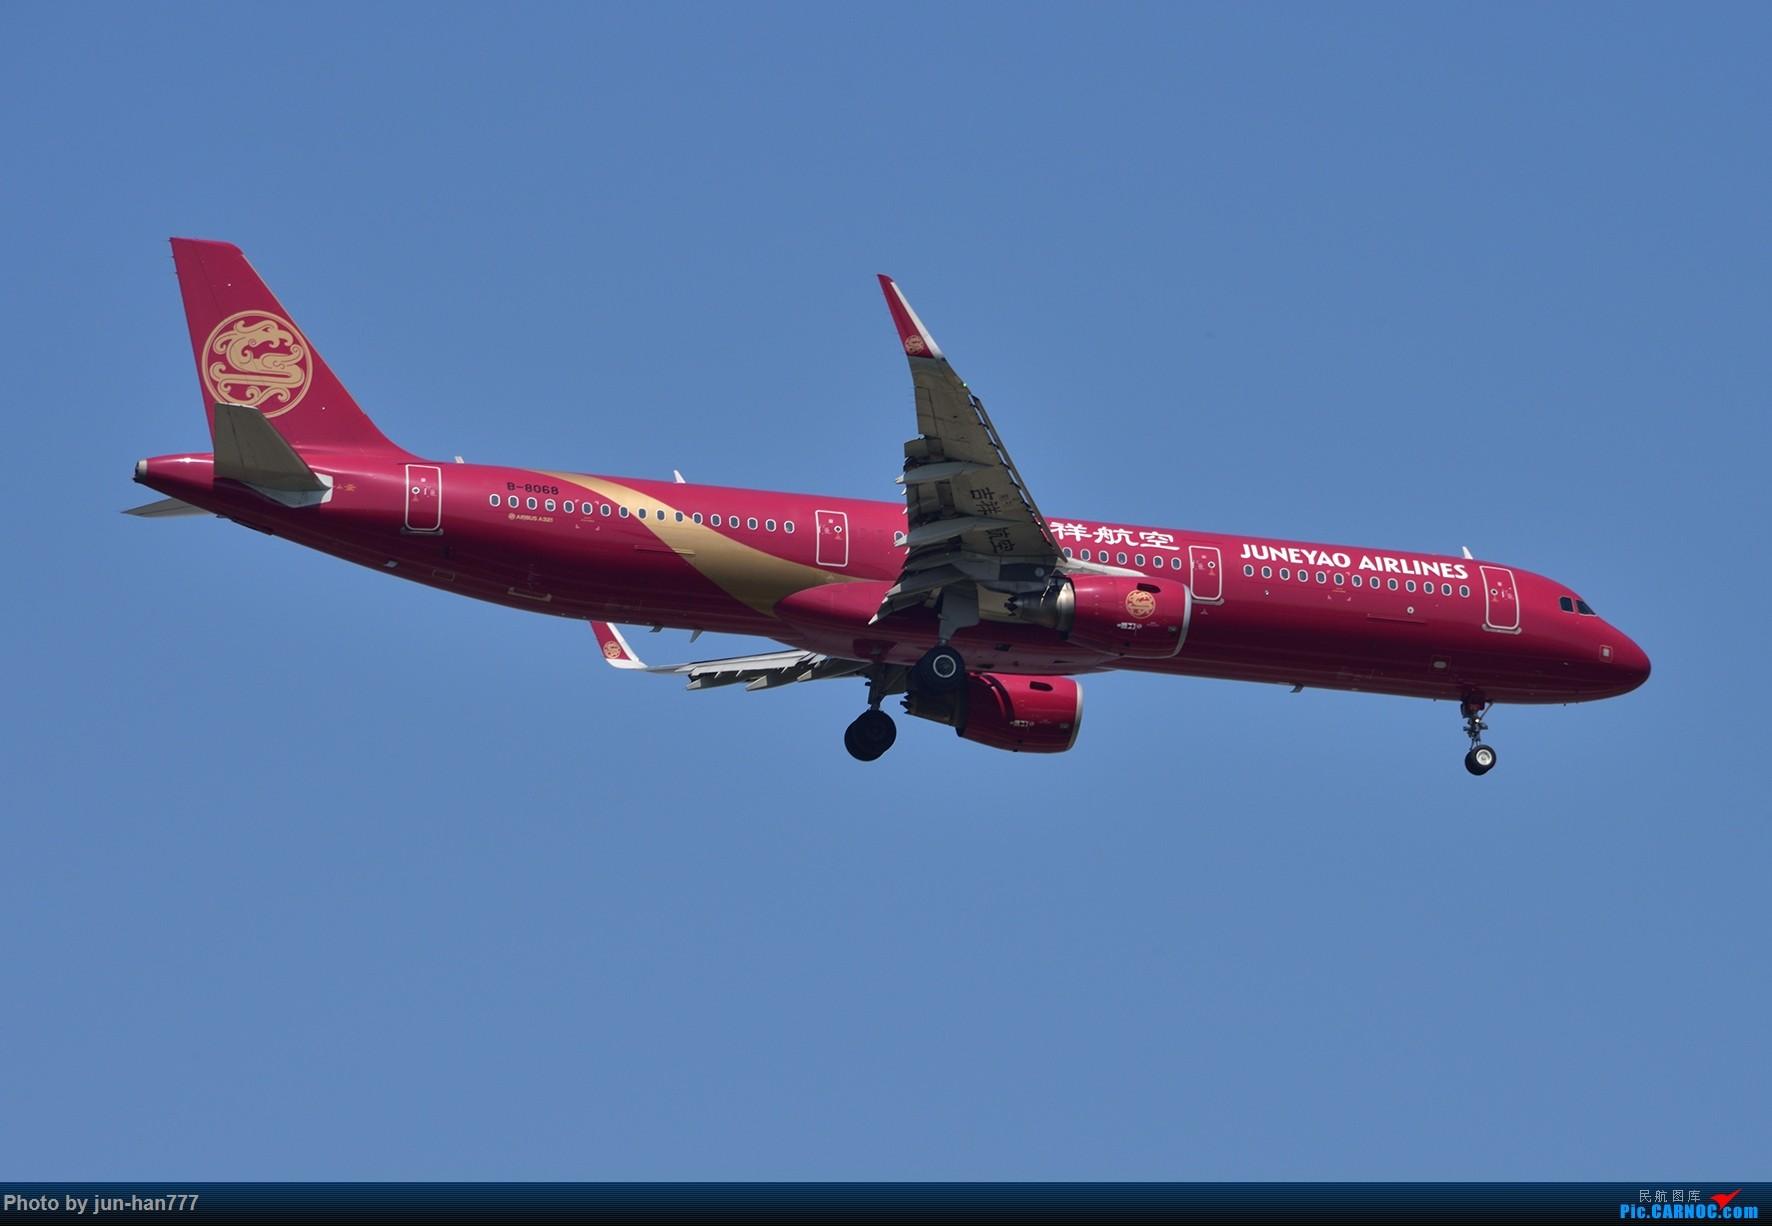 Re:[原创]PVG 晴朗的天空,靓丽的大鸟 AIRBUS A321-200 B-8068